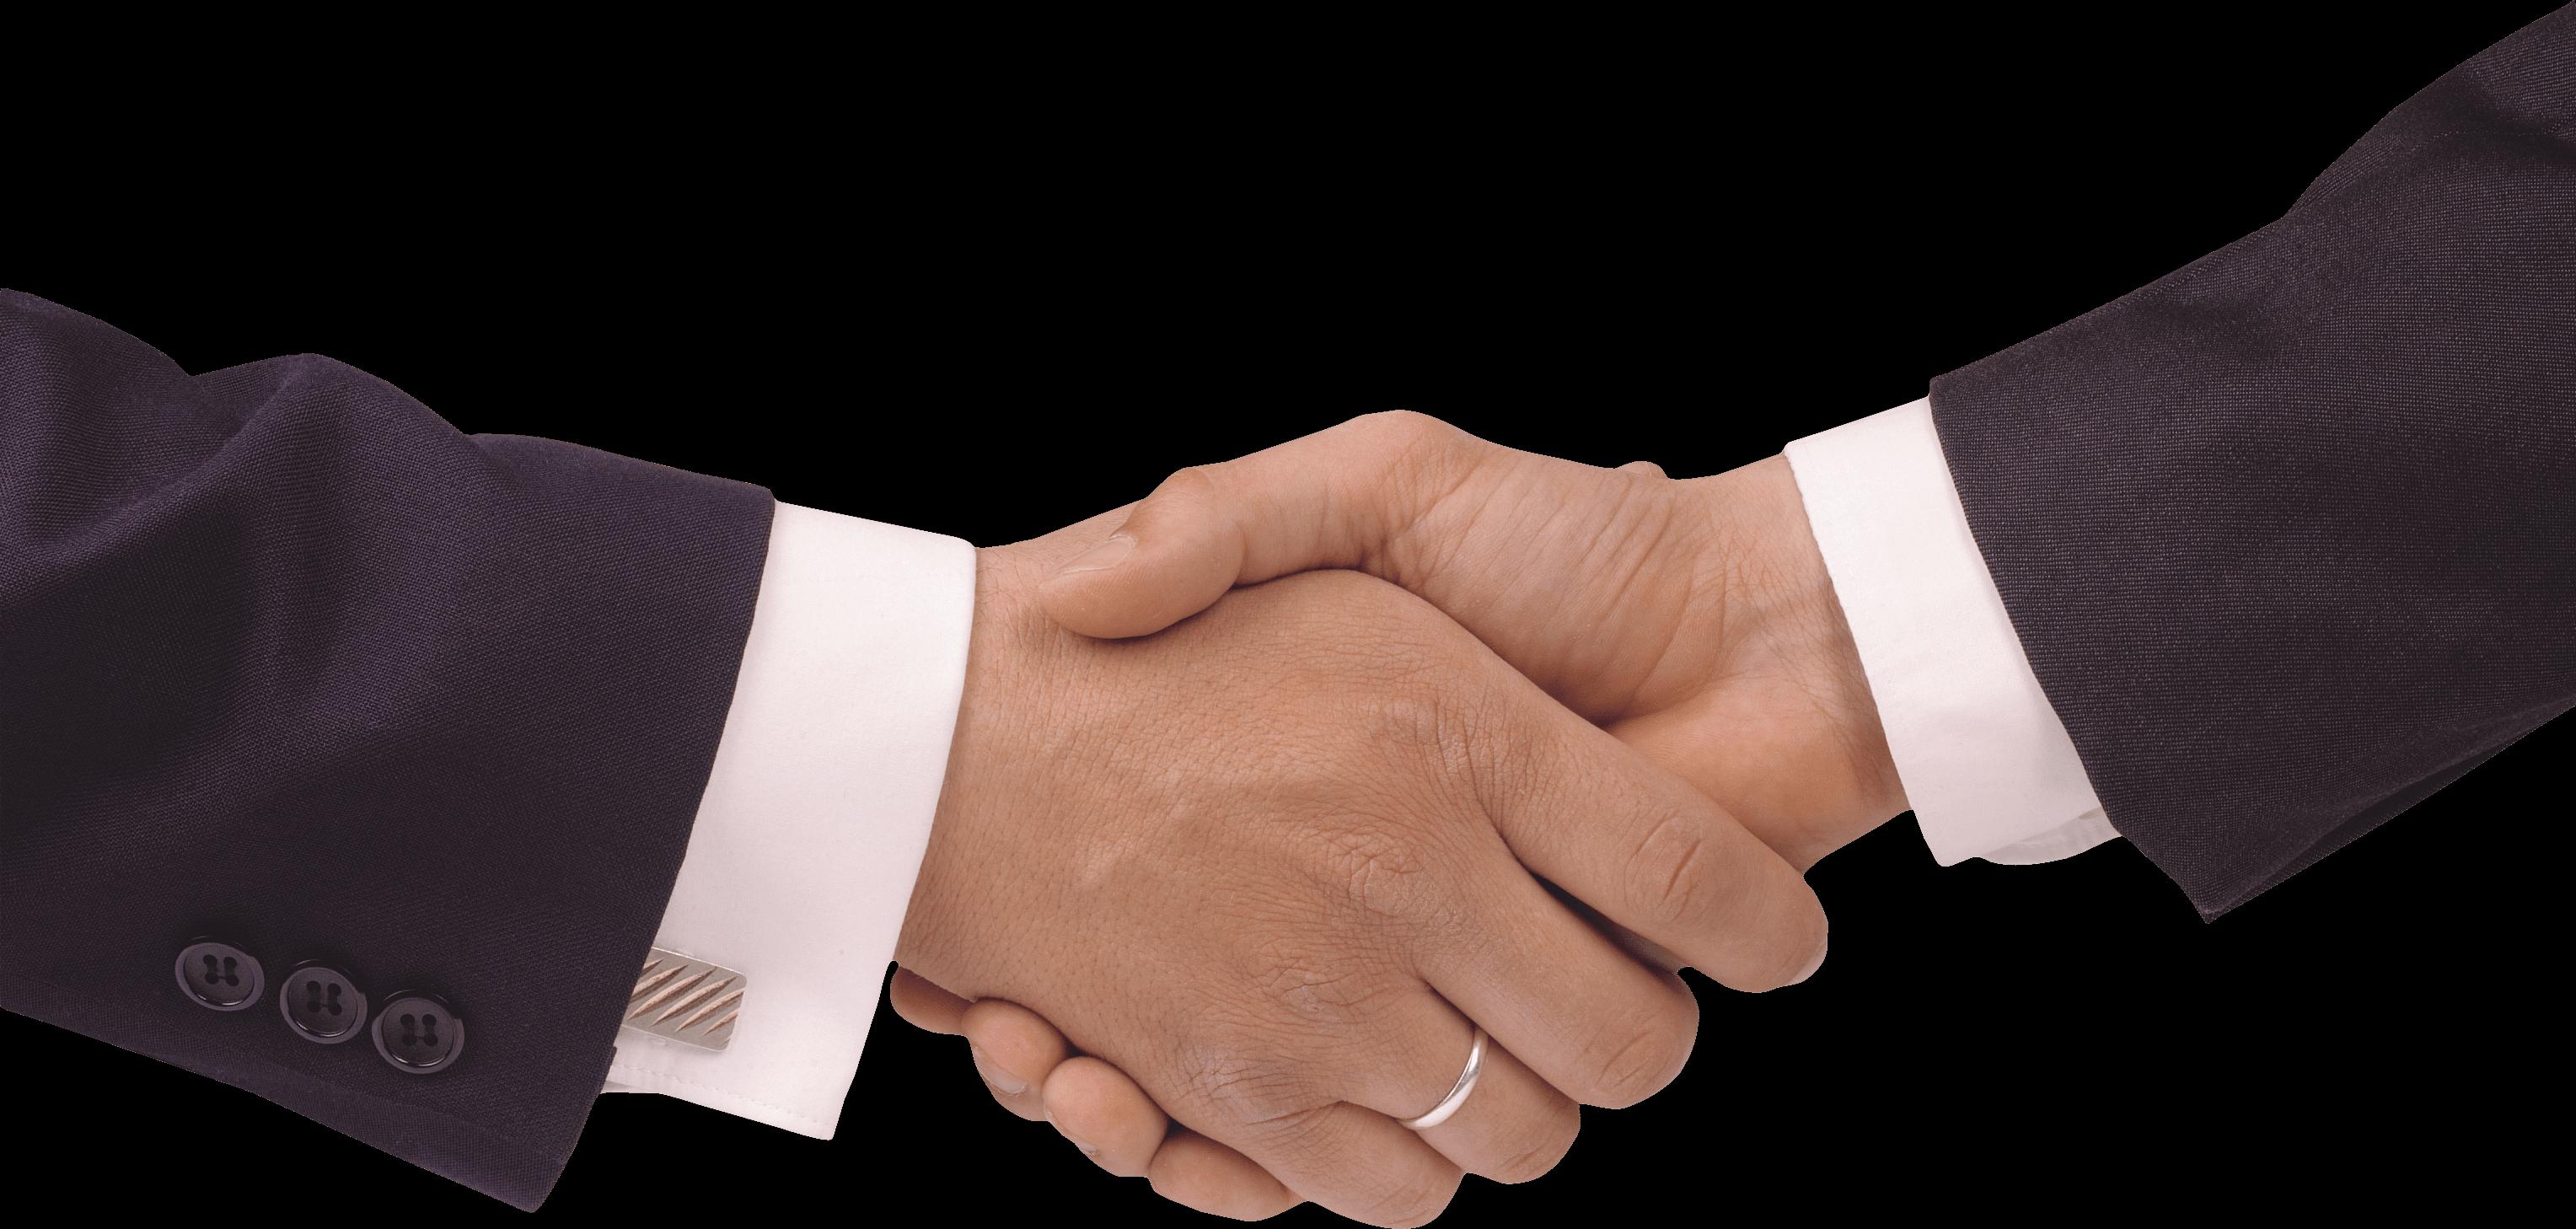 Handshake clipart business customer. Clip art png hands